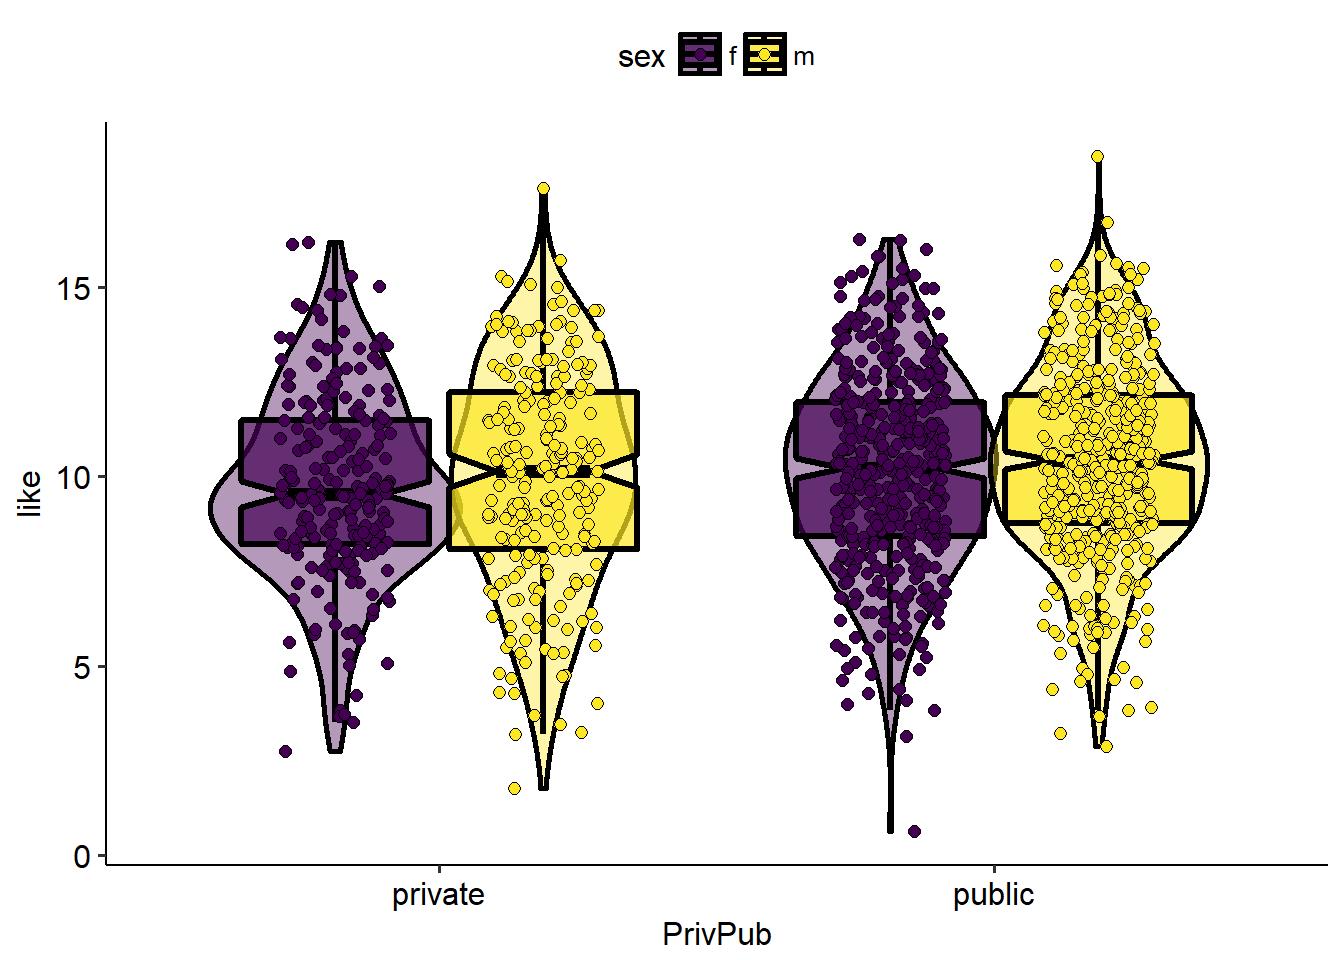 plot_unnamed-chunk-6-1